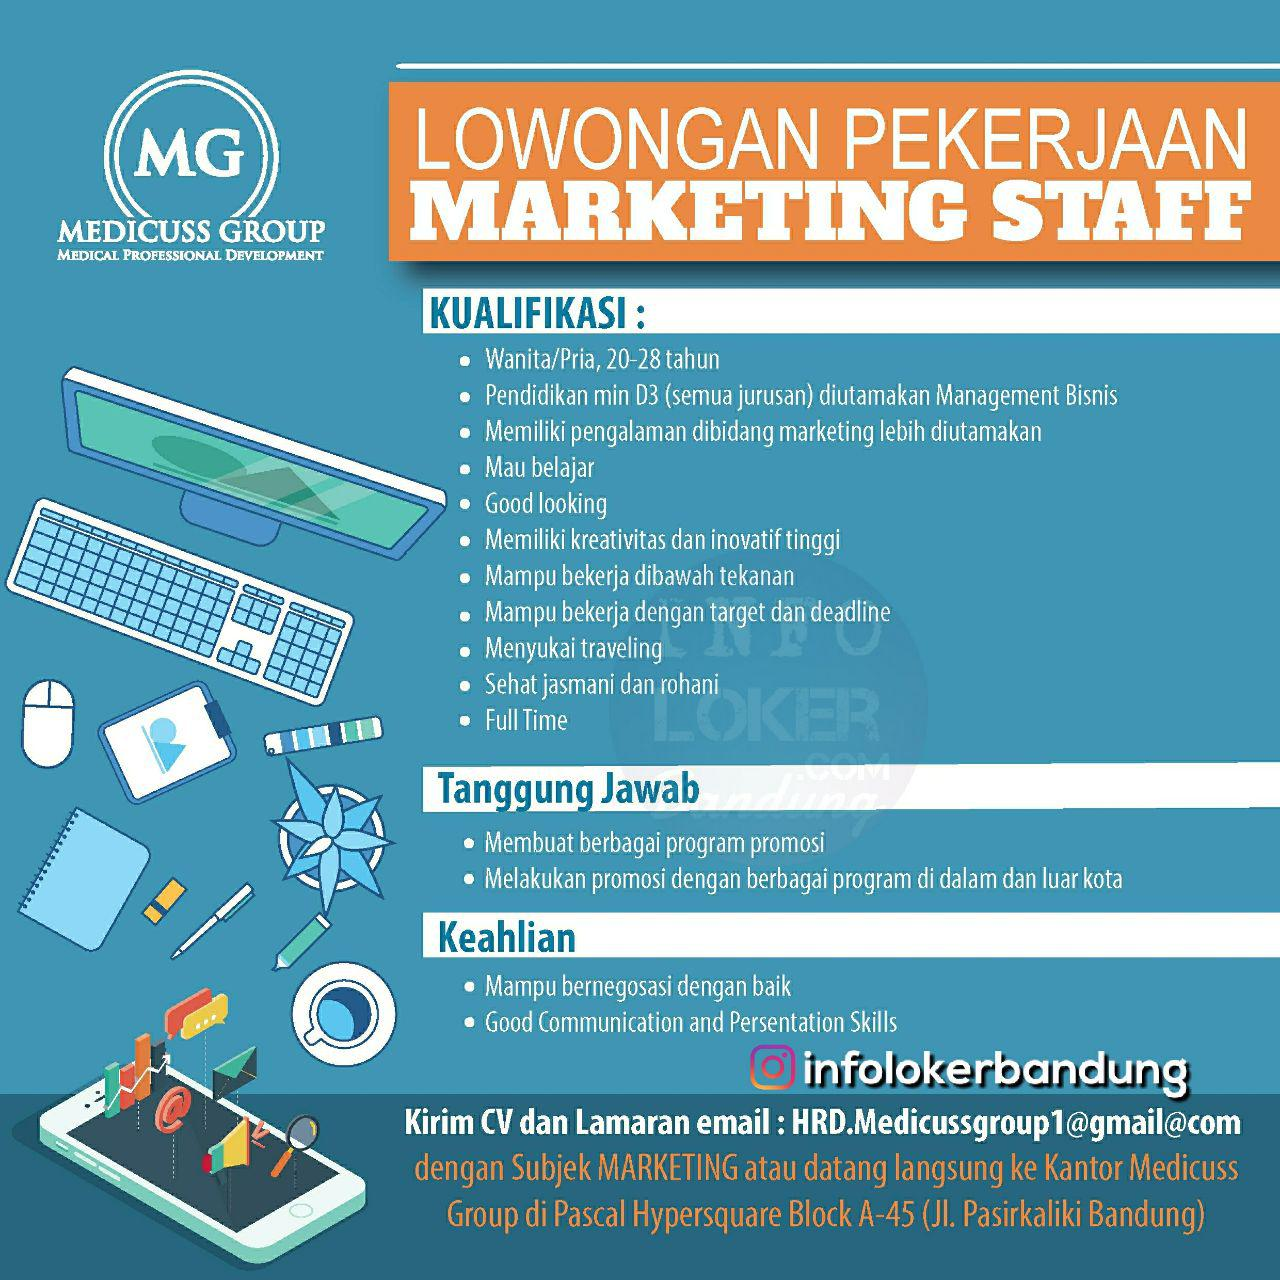 Lowongan Kerja Marketing Staff Medicuss Group Bandung November 2018